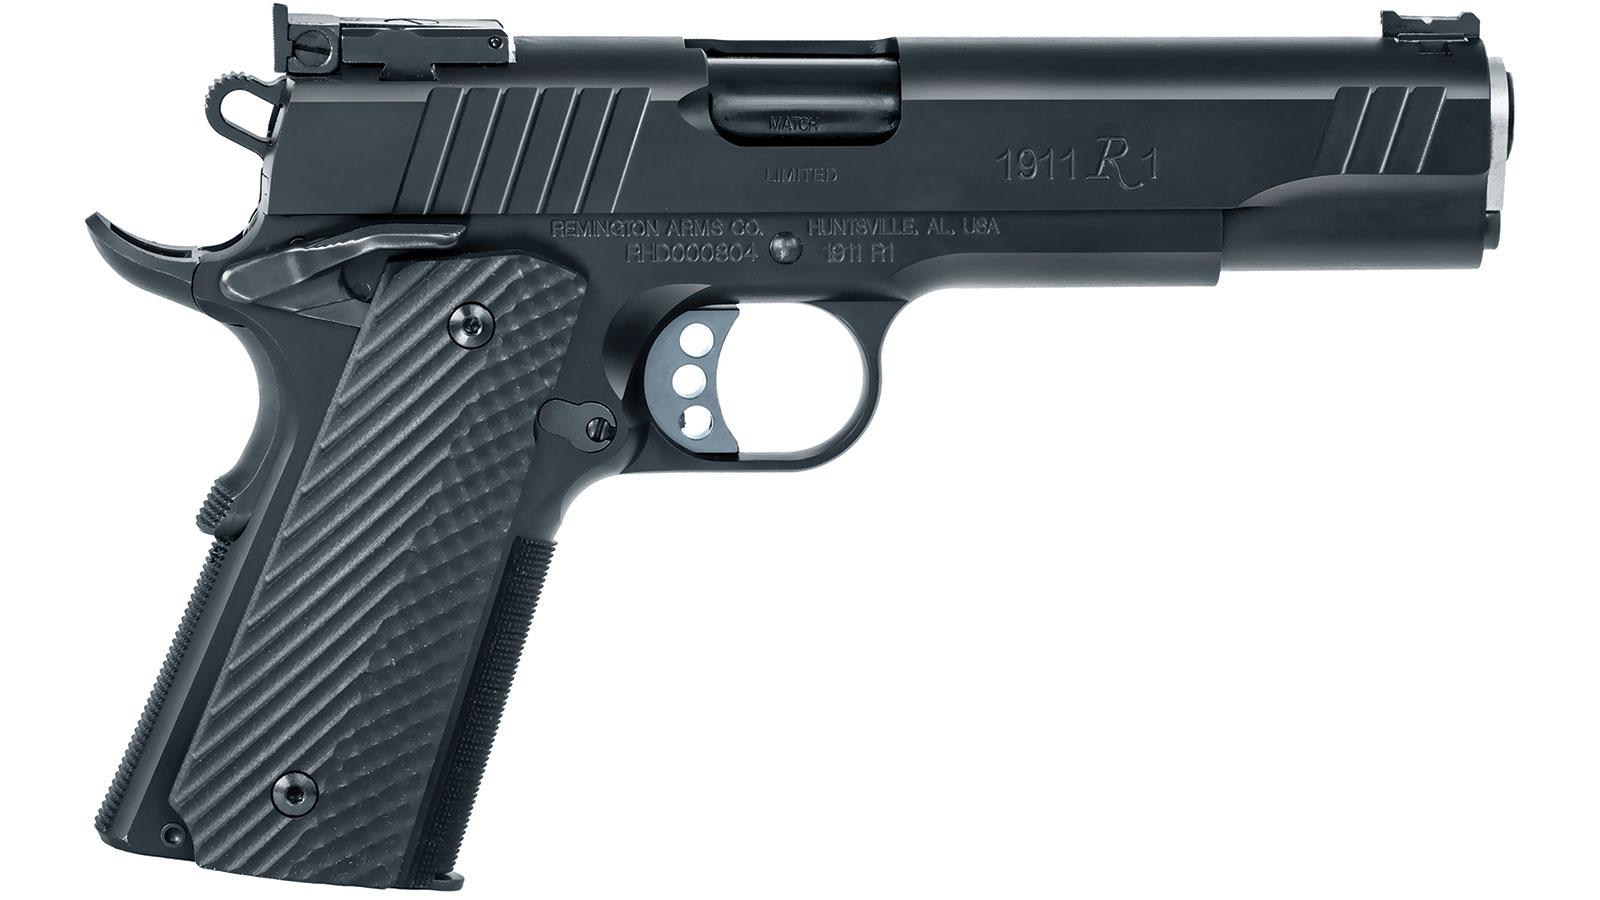 Remington 1911 R1 9mm 5